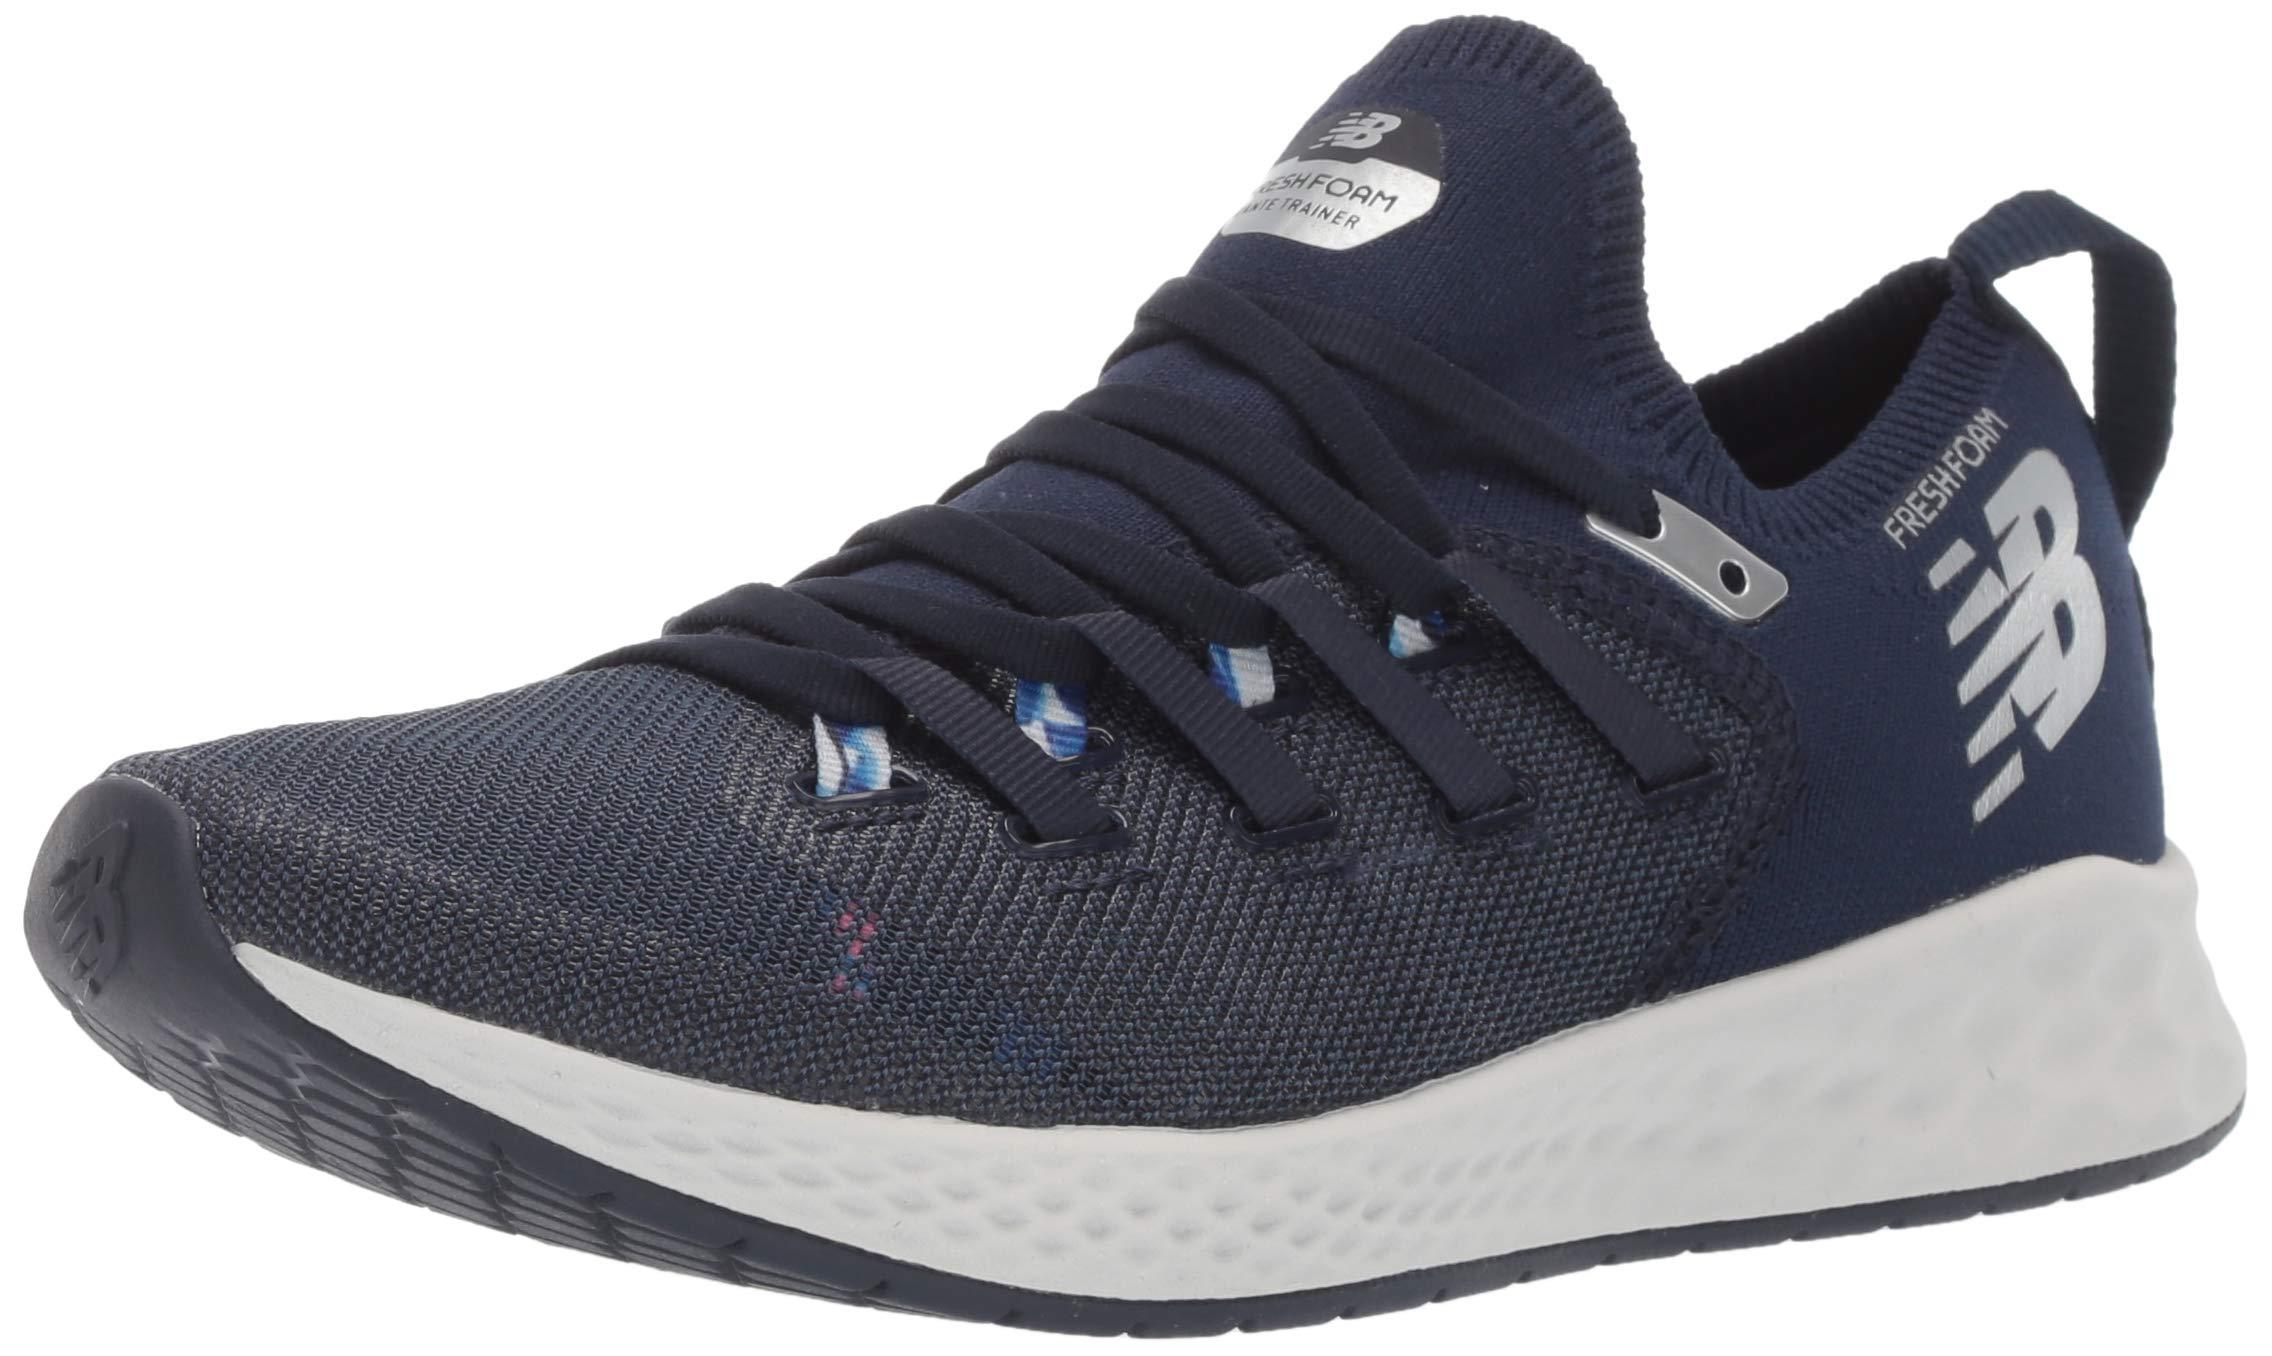 New Balance Women's Zante Trainer V1 Fresh Foam Running Shoe, Pigment/Bleached Guava/UV Blue, 5 B US